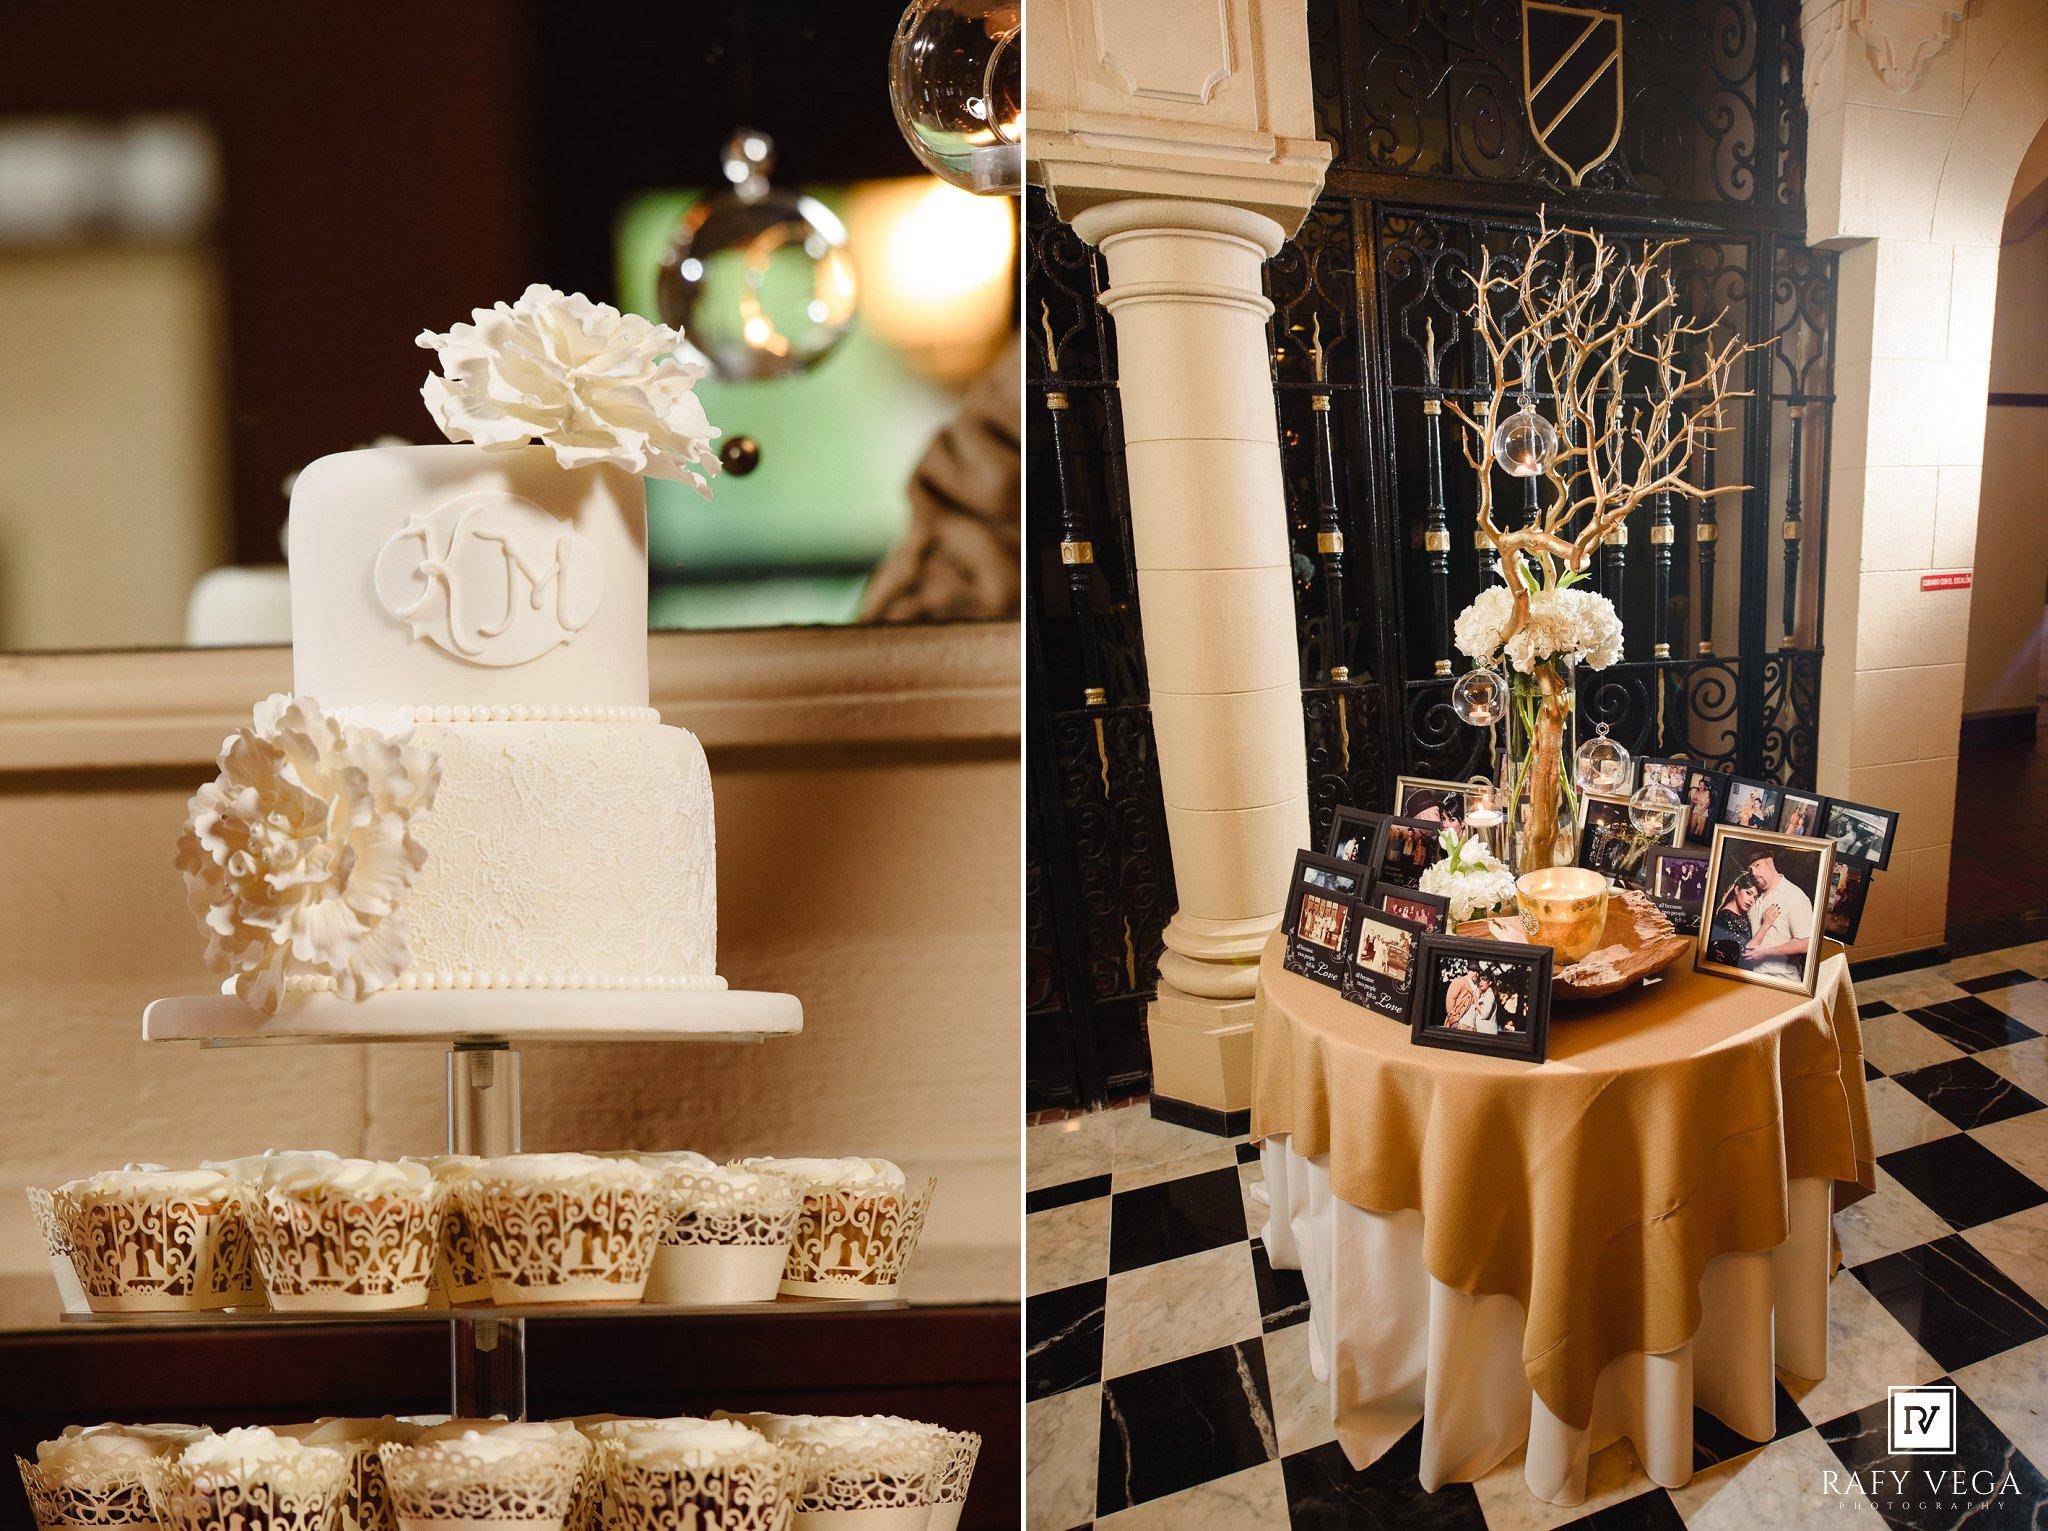 Rom ntica boda en casa espa a viejo san juan for Decoracion boda campestre